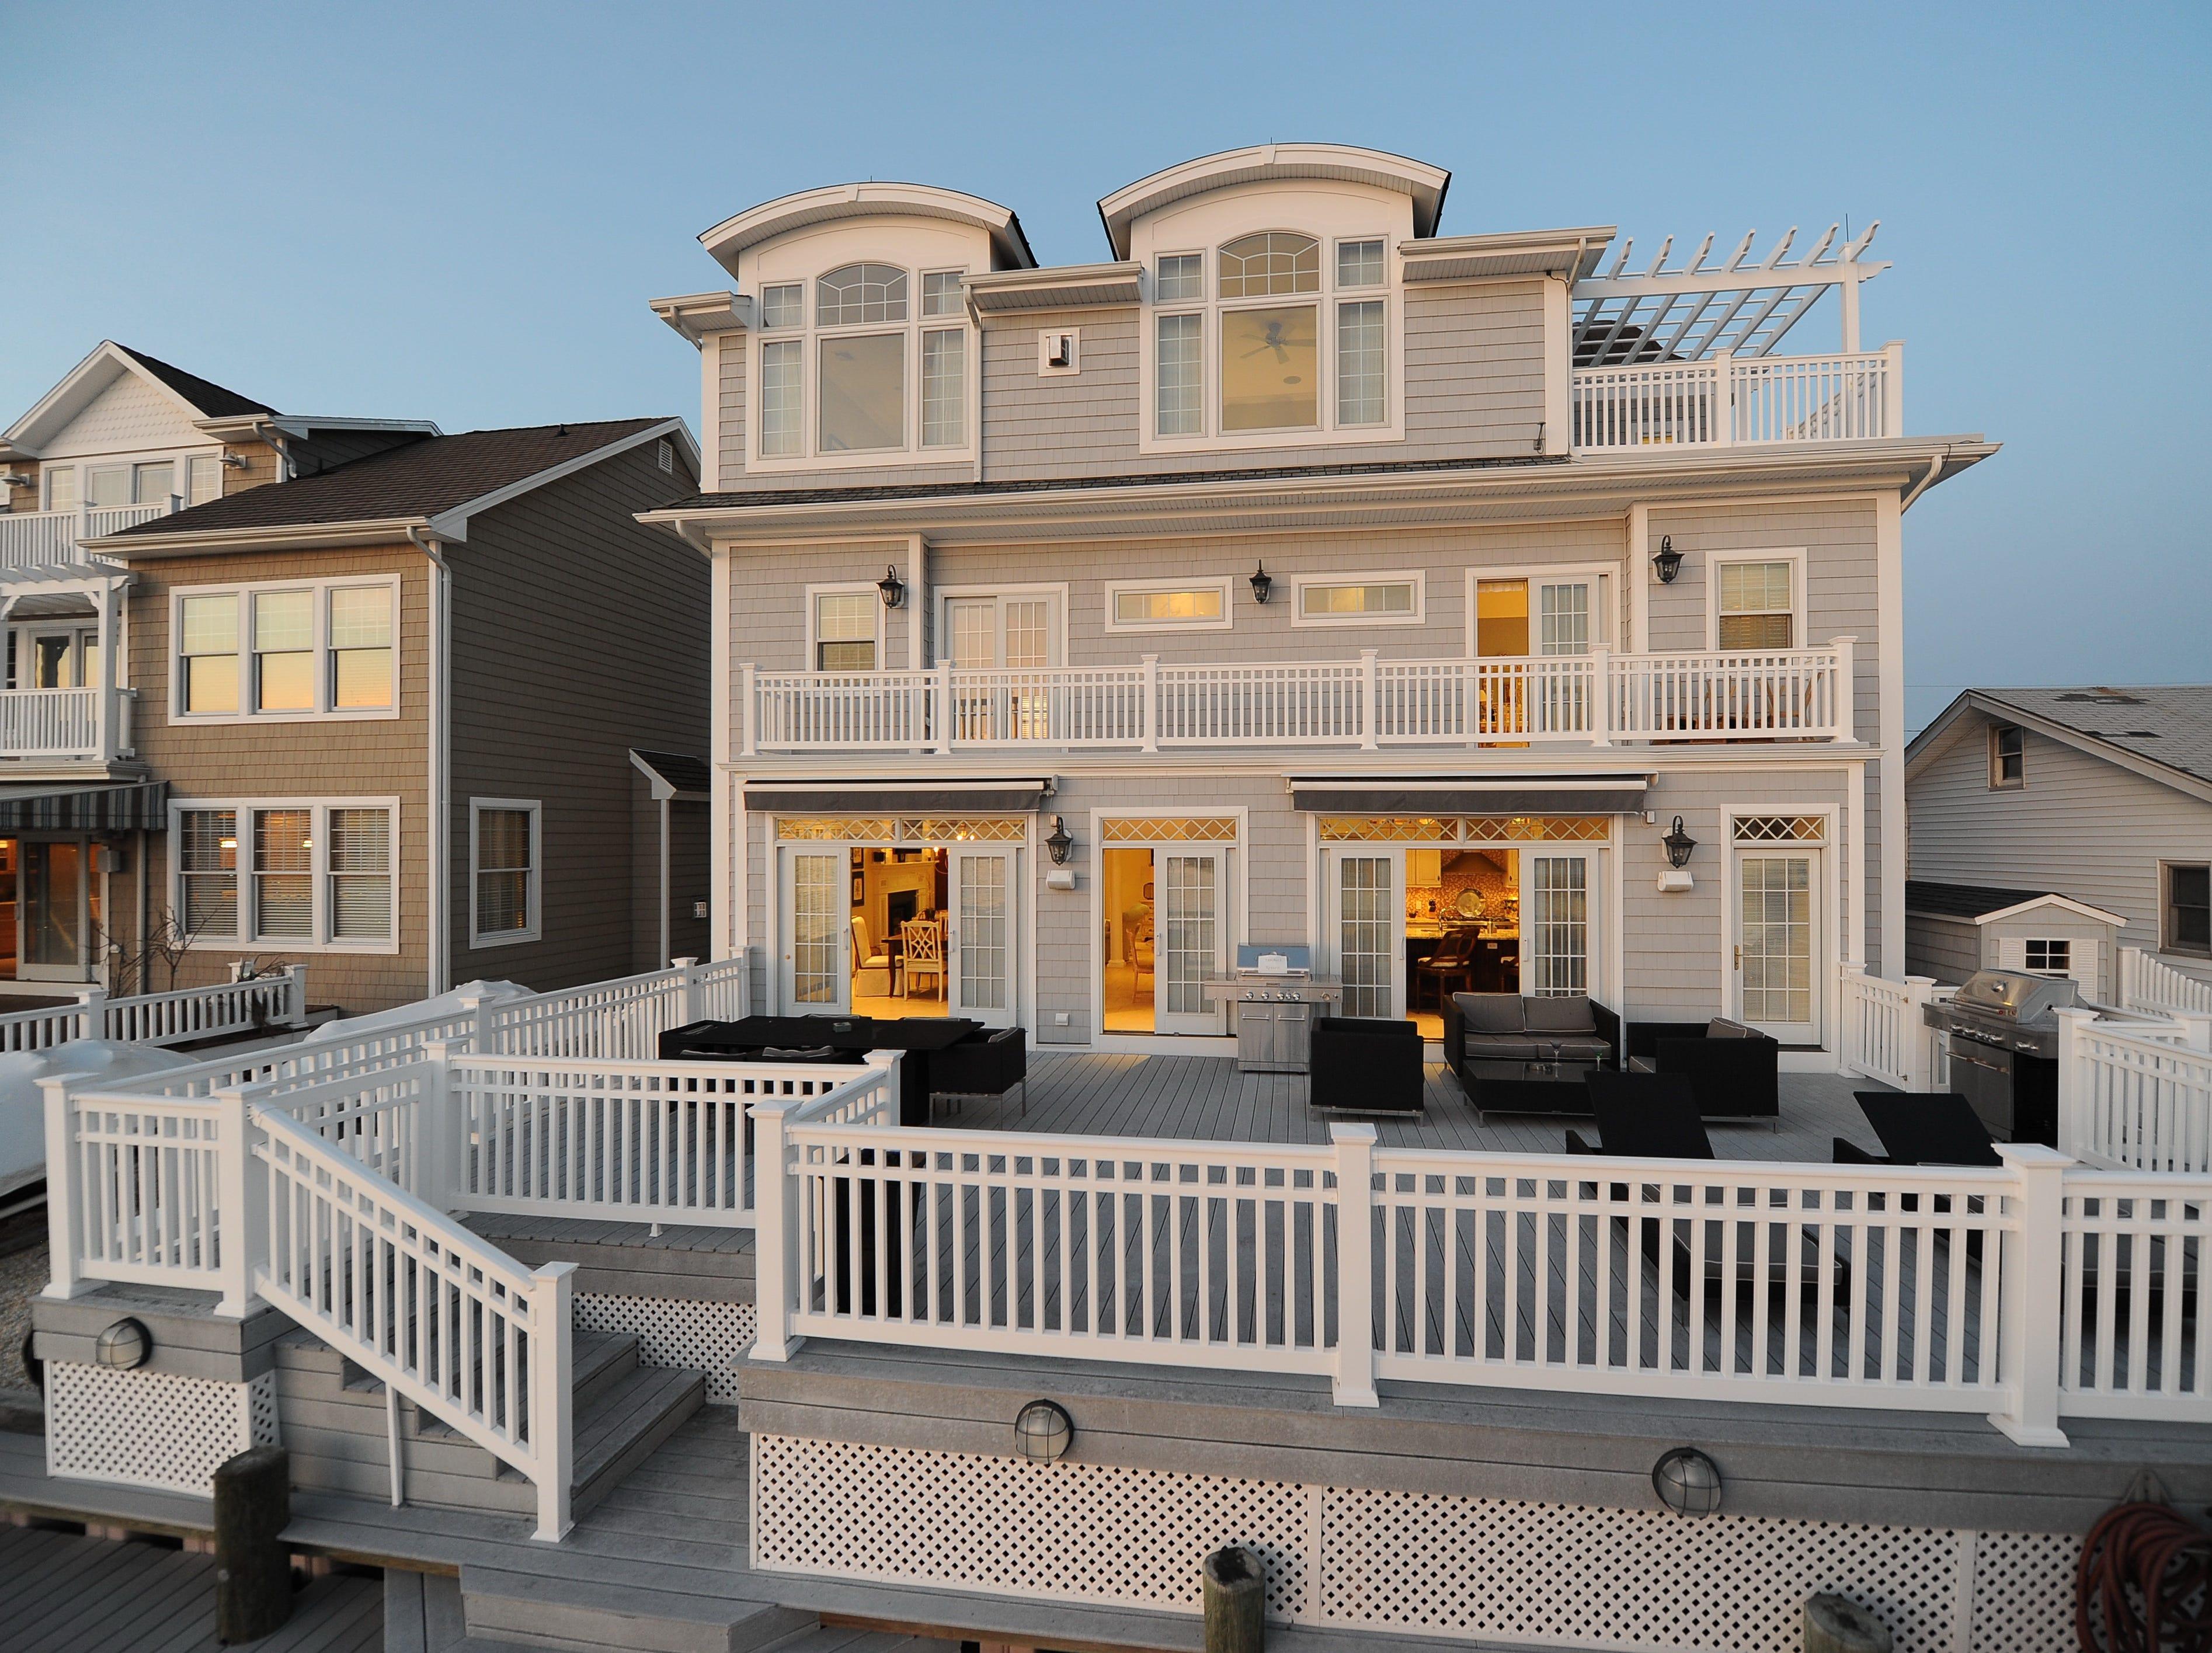 Lavallette custom home features captivating views